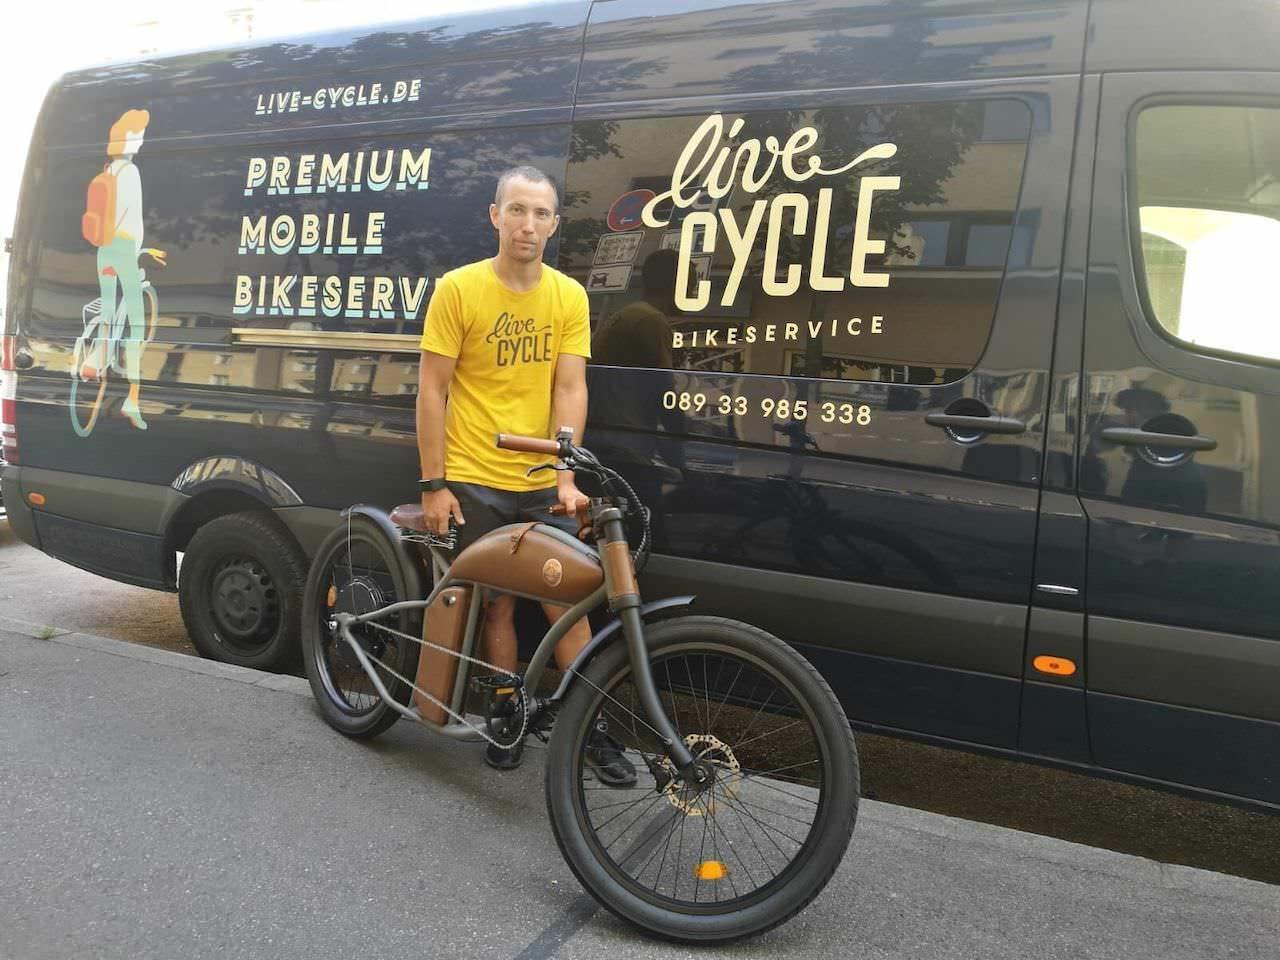 Rayvolt E-Bikes und LiveCycle